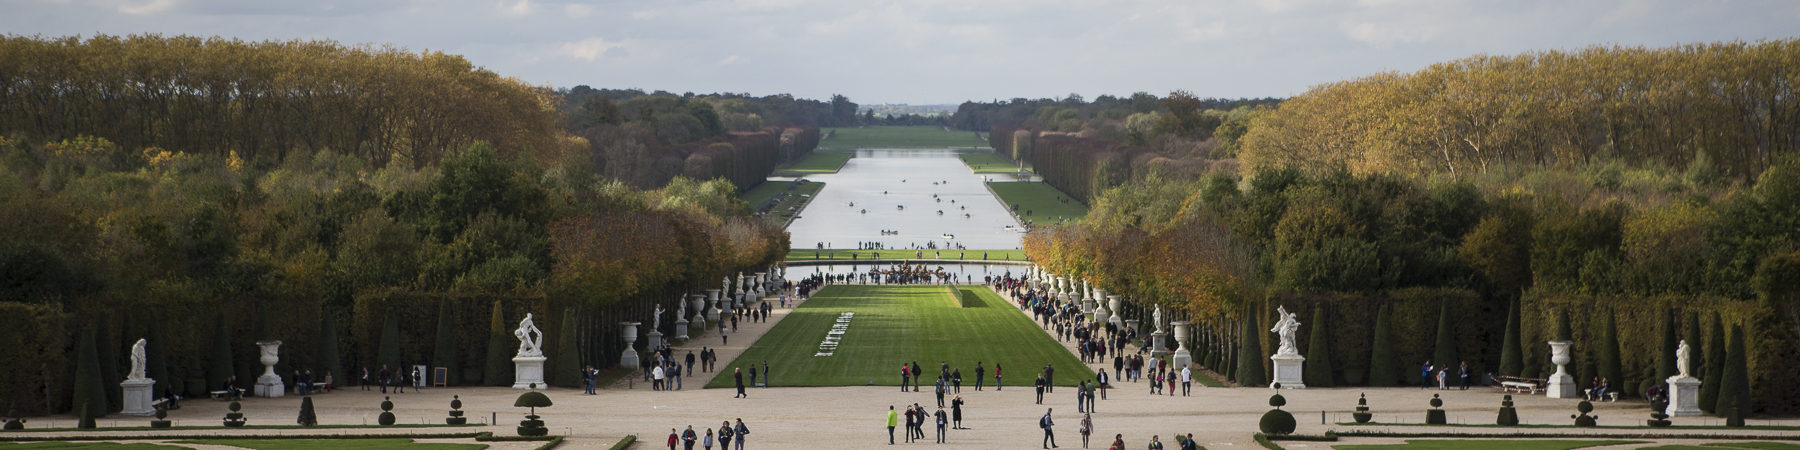 Gardens of Versailles-6.jpg